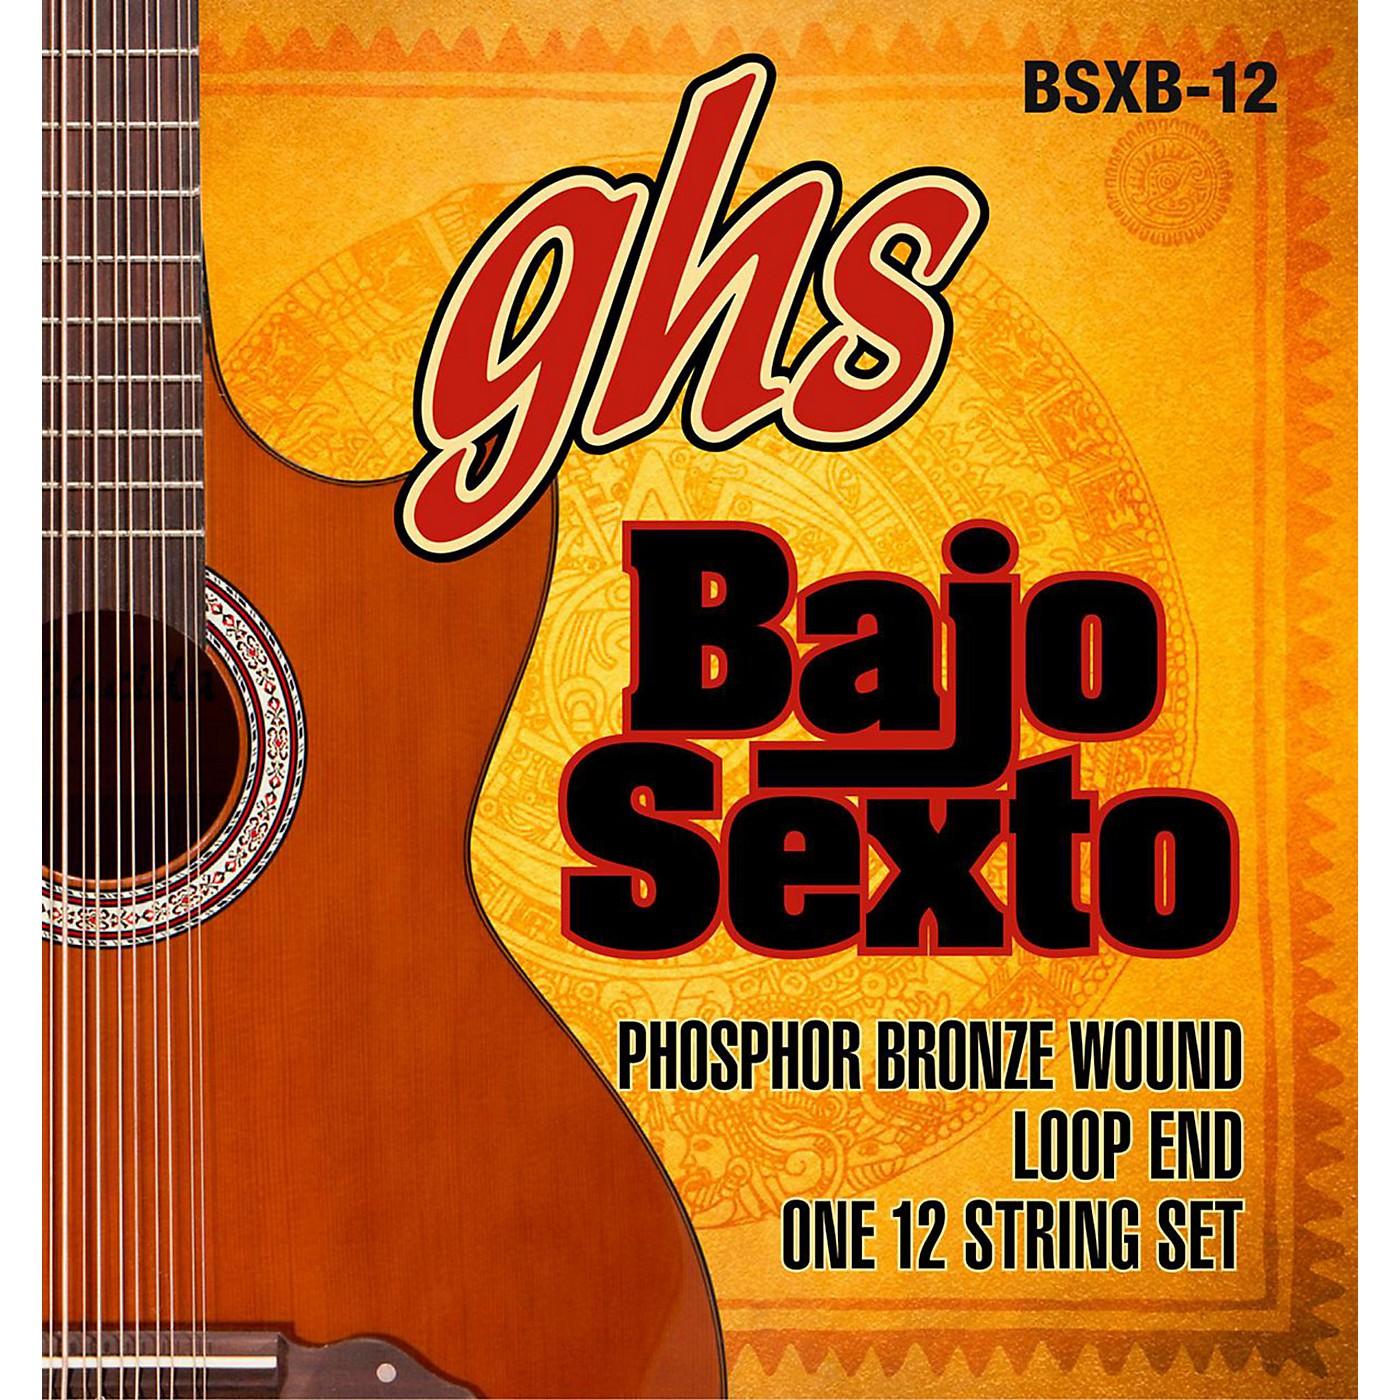 GHS Bajo Sexto 12-String Phosphor Bronze Acoustic Guitar Strings thumbnail